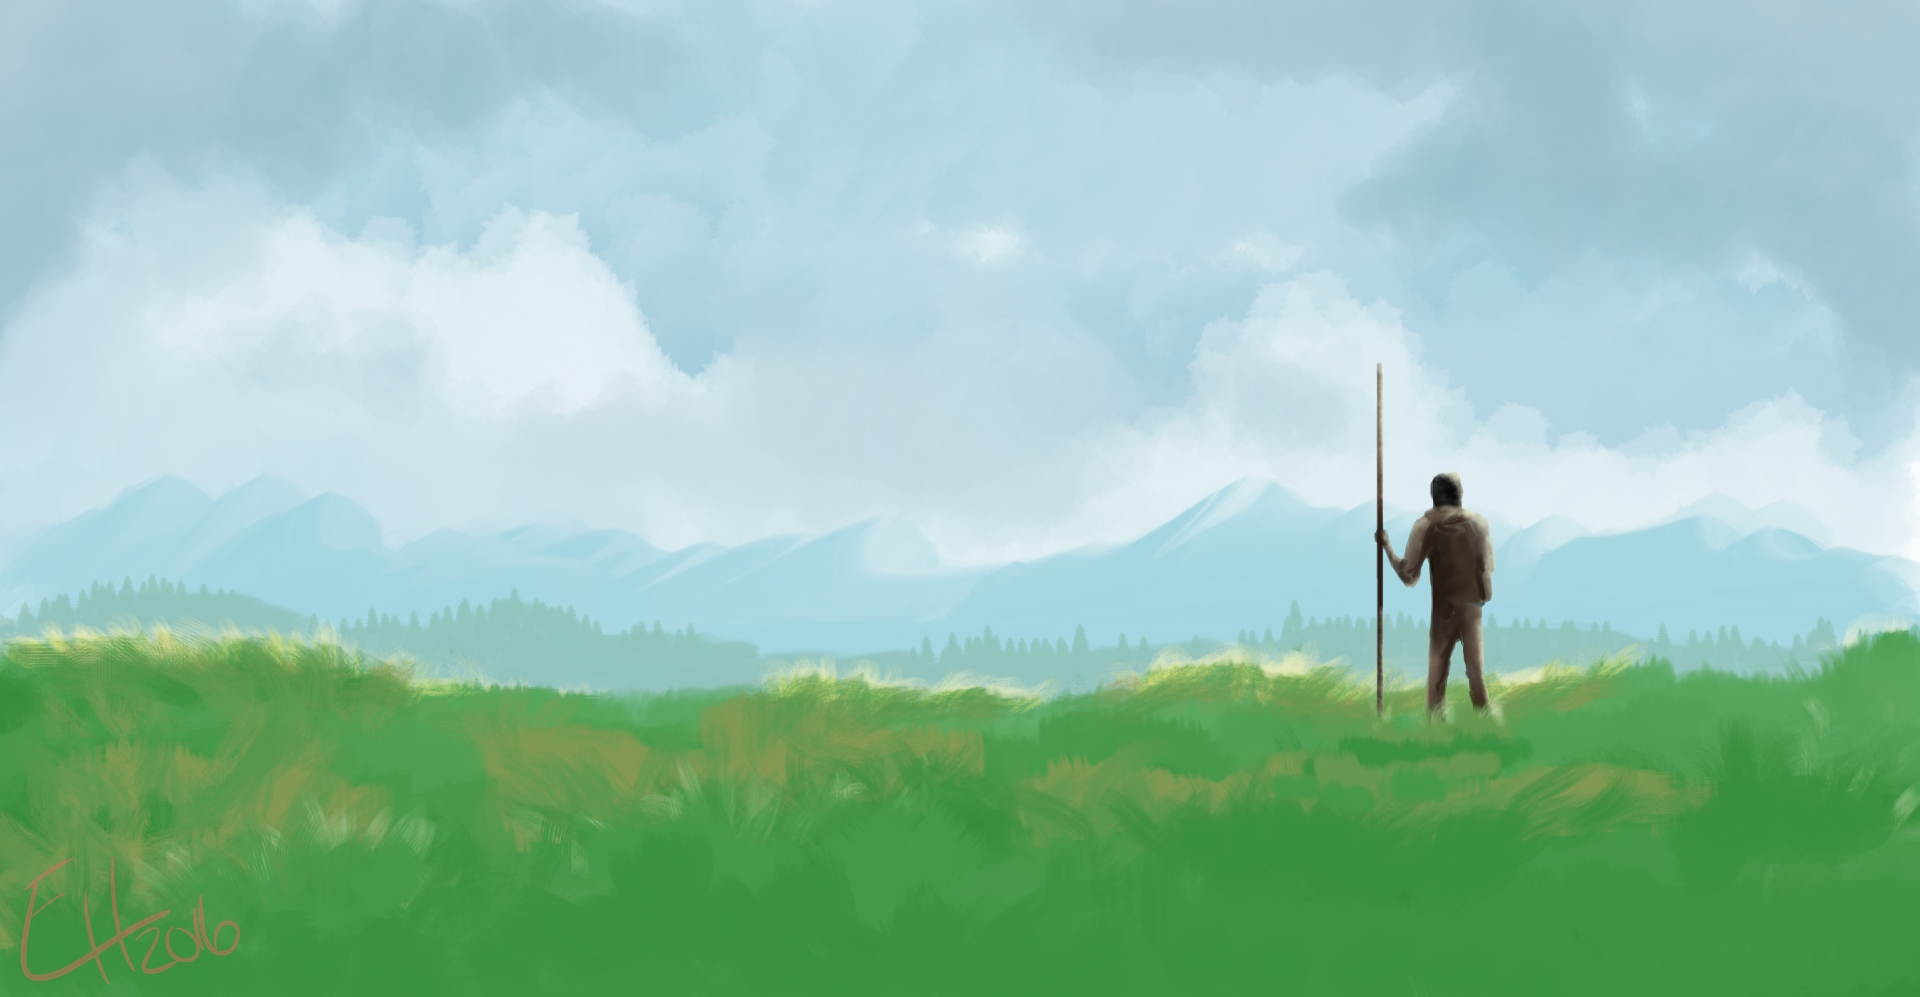 Digital Painting 028 - Adventure